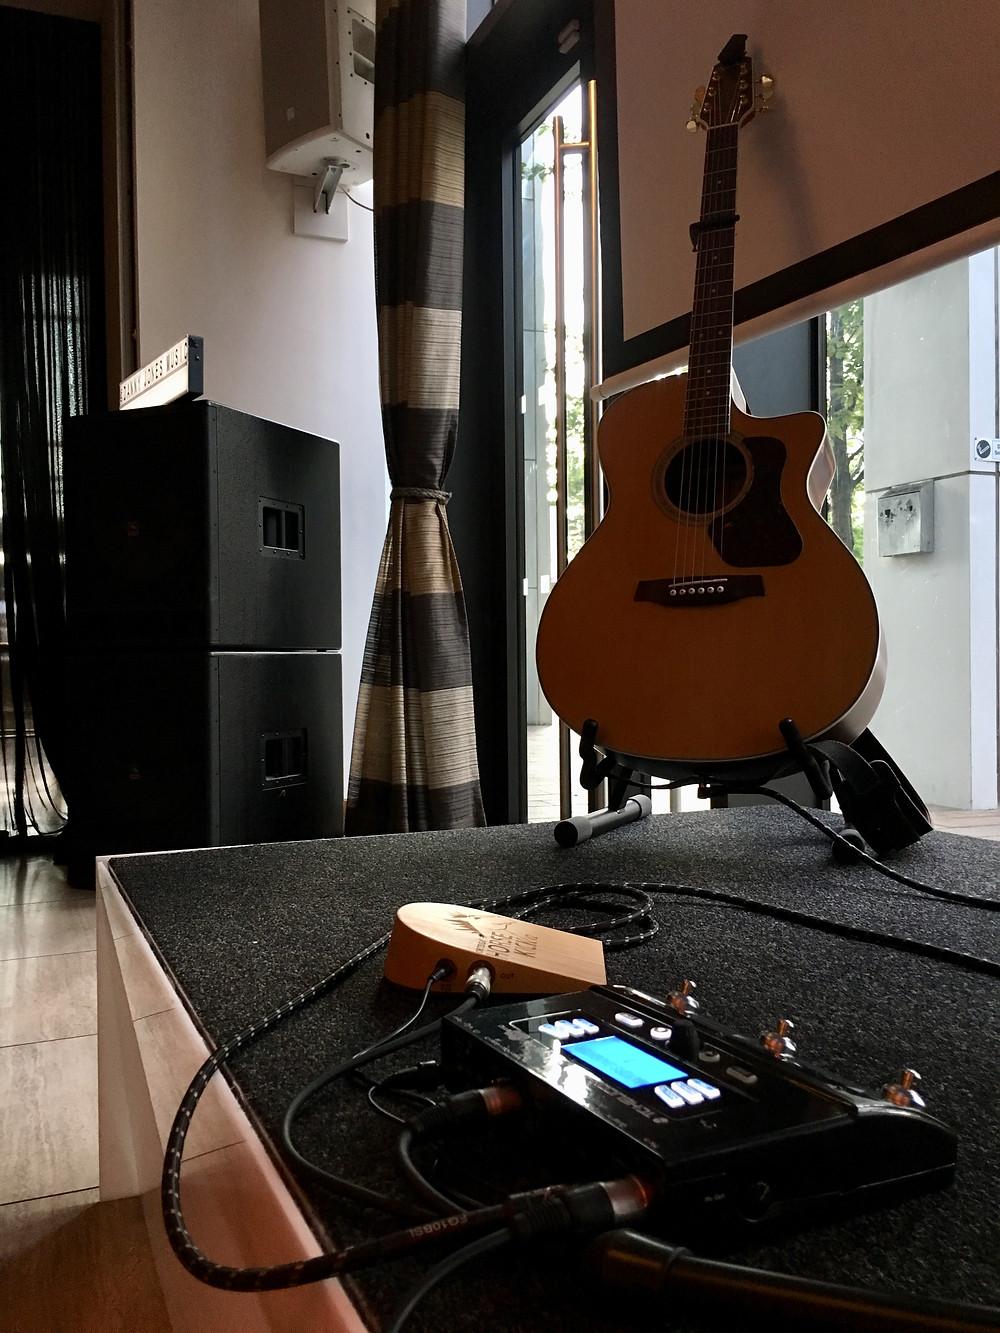 Danny Jones Music at The Hilton, Liverpool.